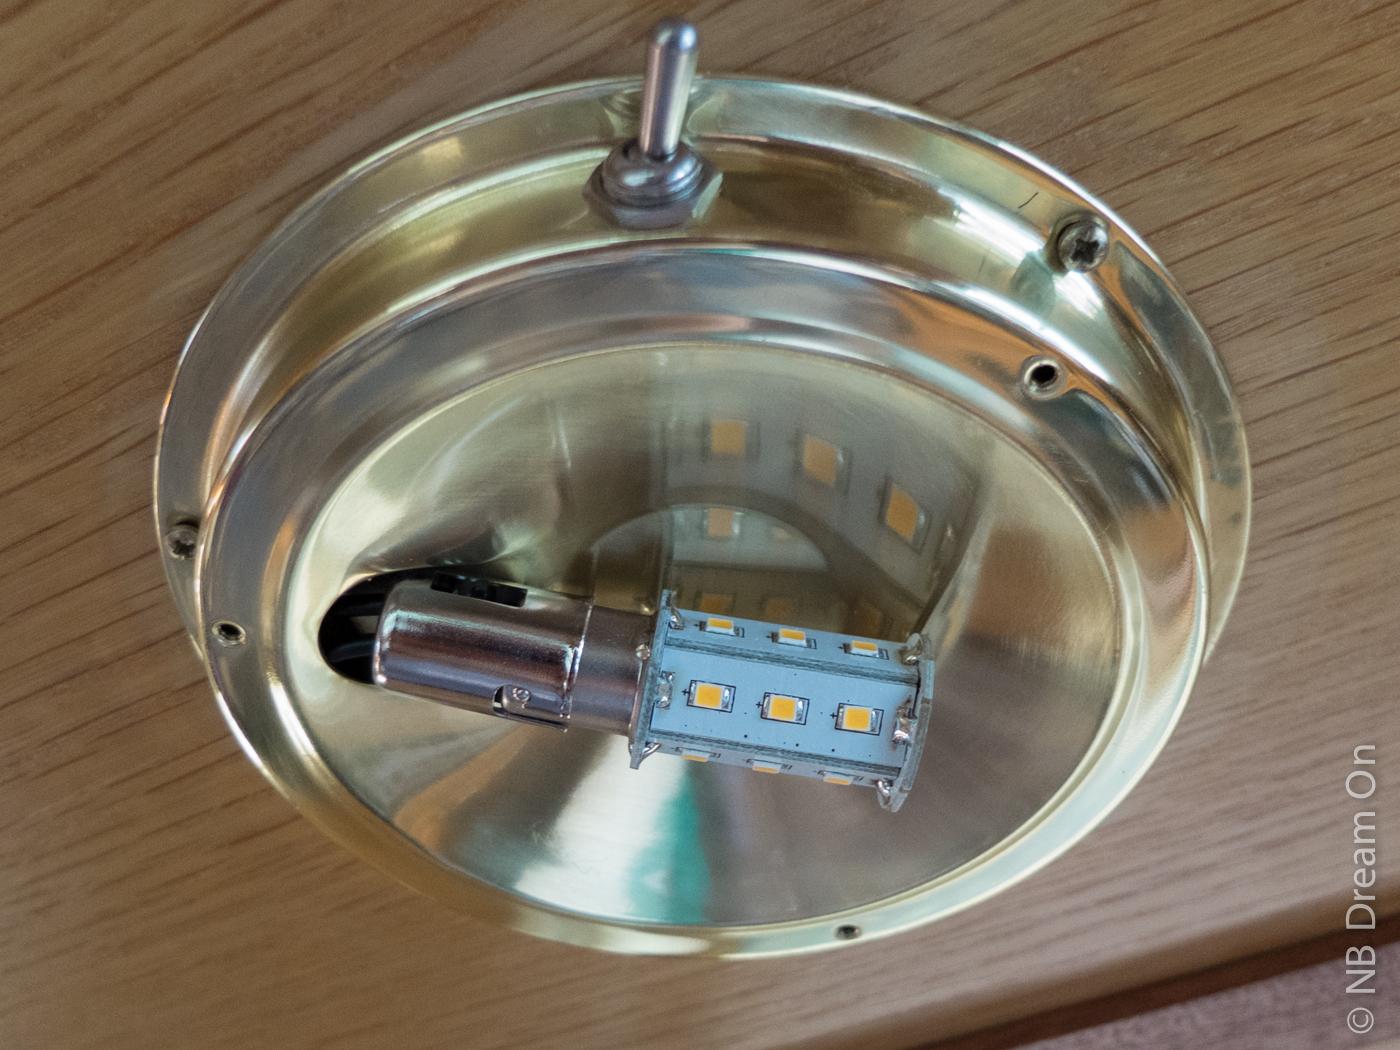 narrowboat dream on passage aux ampoules led bord du. Black Bedroom Furniture Sets. Home Design Ideas